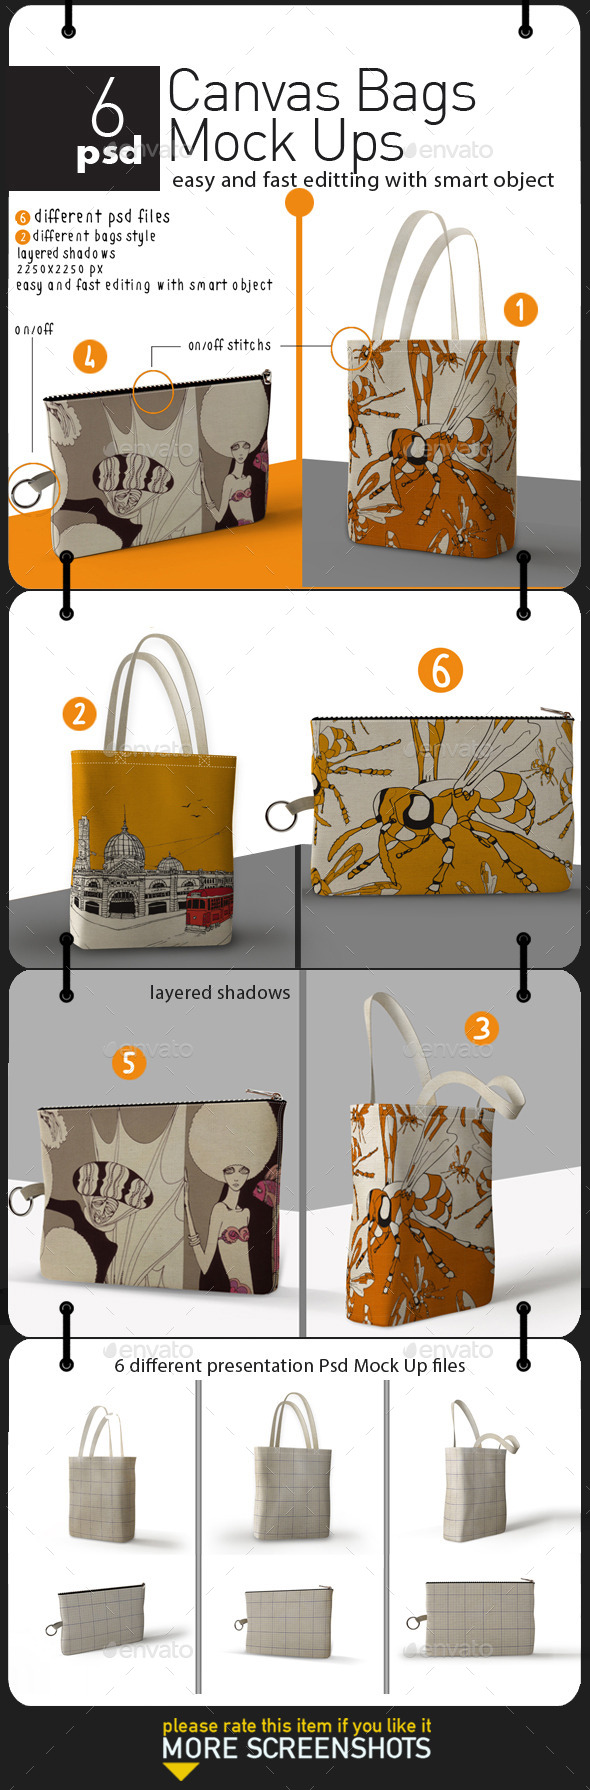 GraphicRiver Canvas Bags Mock Ups 11393701